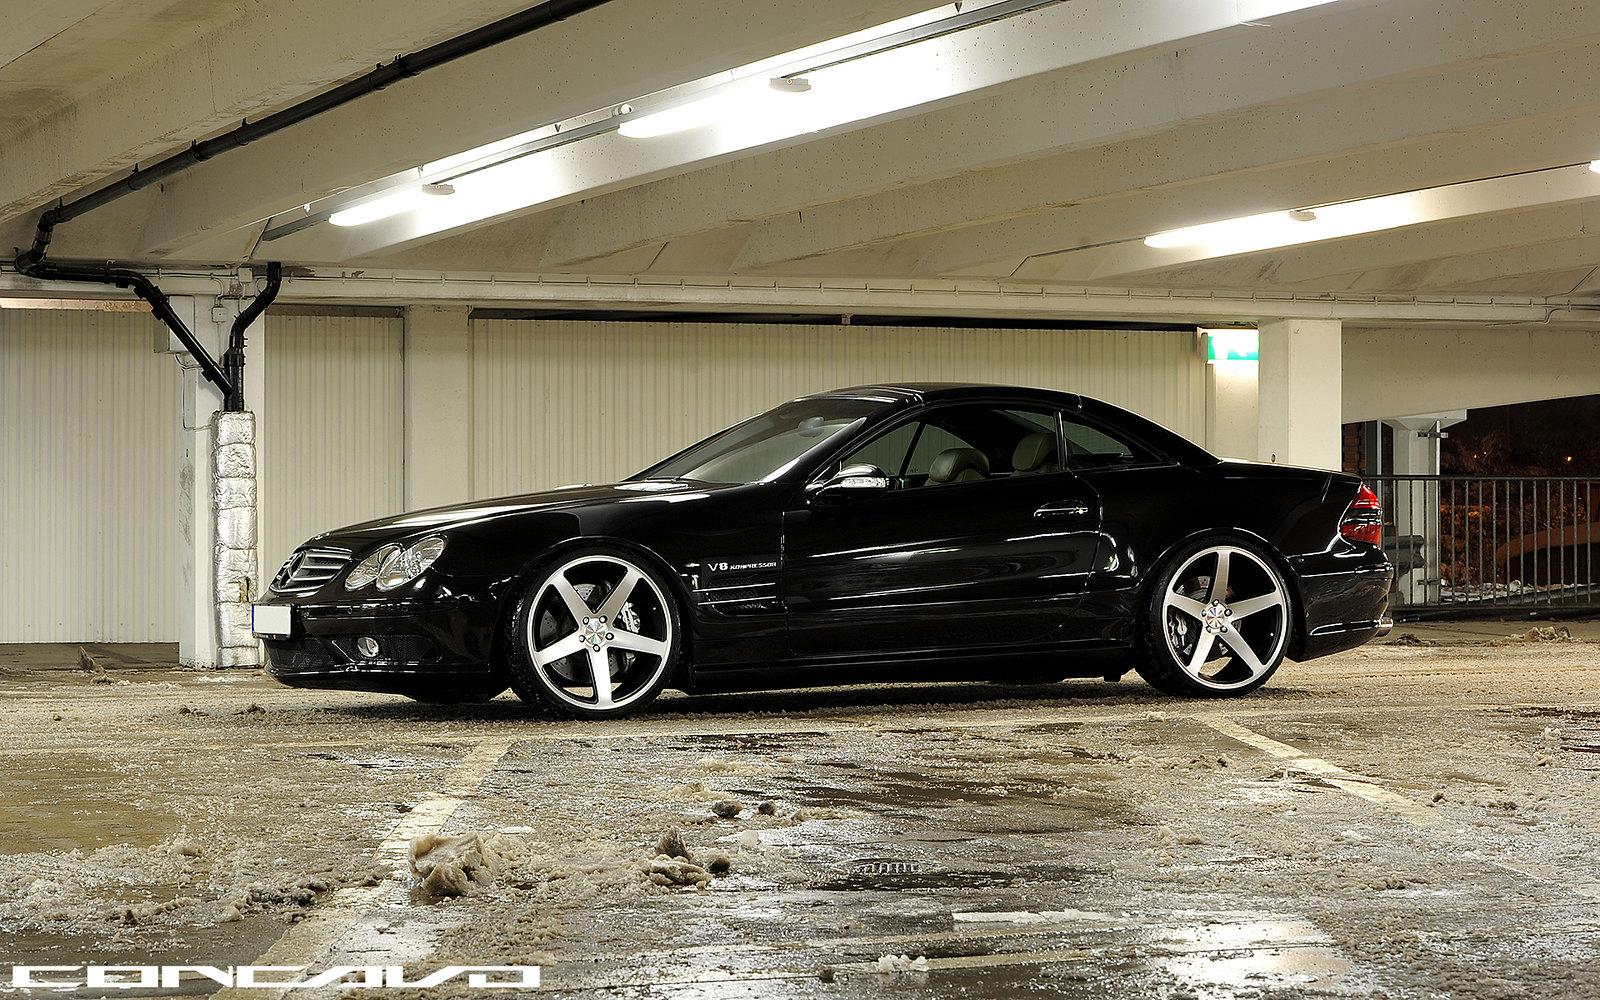 Mercedes Benz San Antonio >> MERCEDES BENZ SL55 AMG ON CONCAVO CW-5 - MBWorld.org Forums